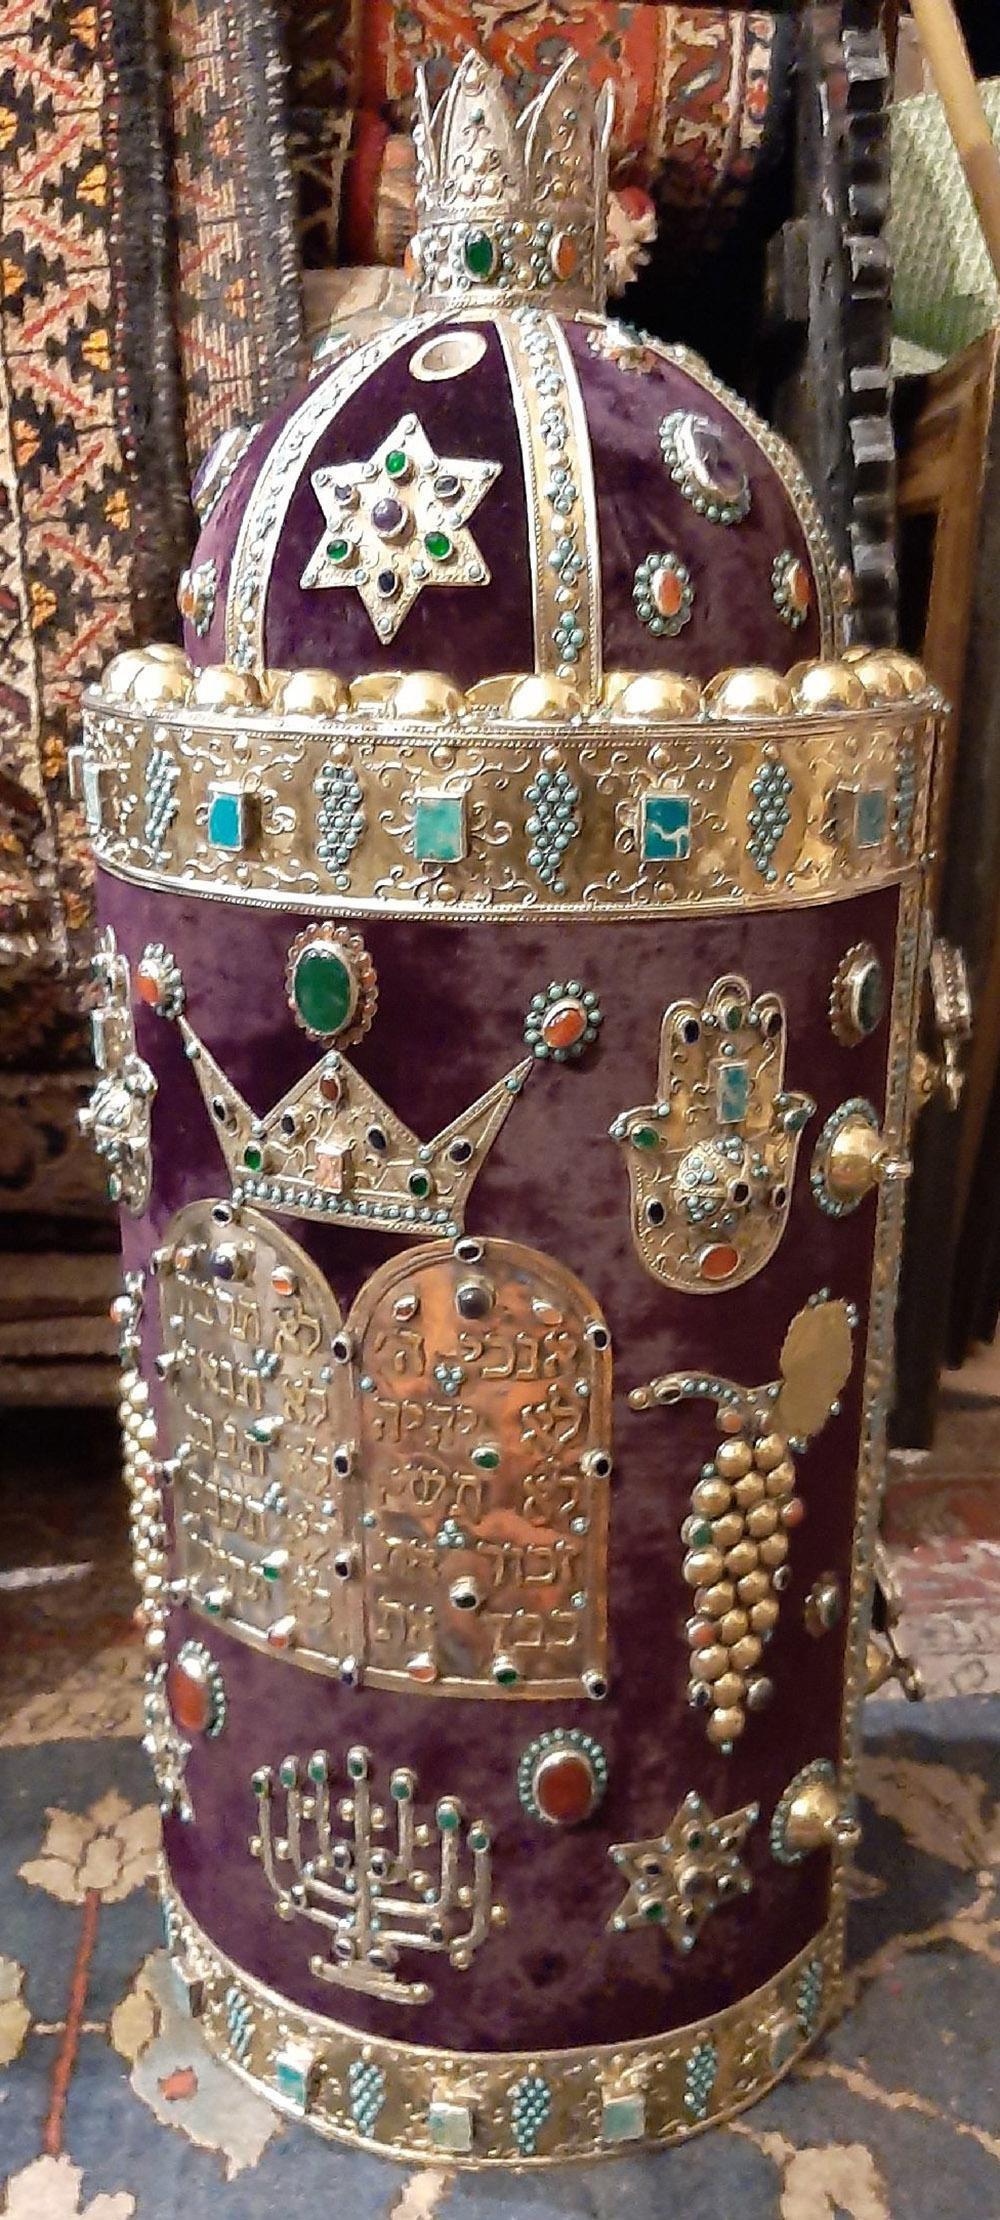 JUDAICA, Silver, agate stones, Perisian Case for Sefer